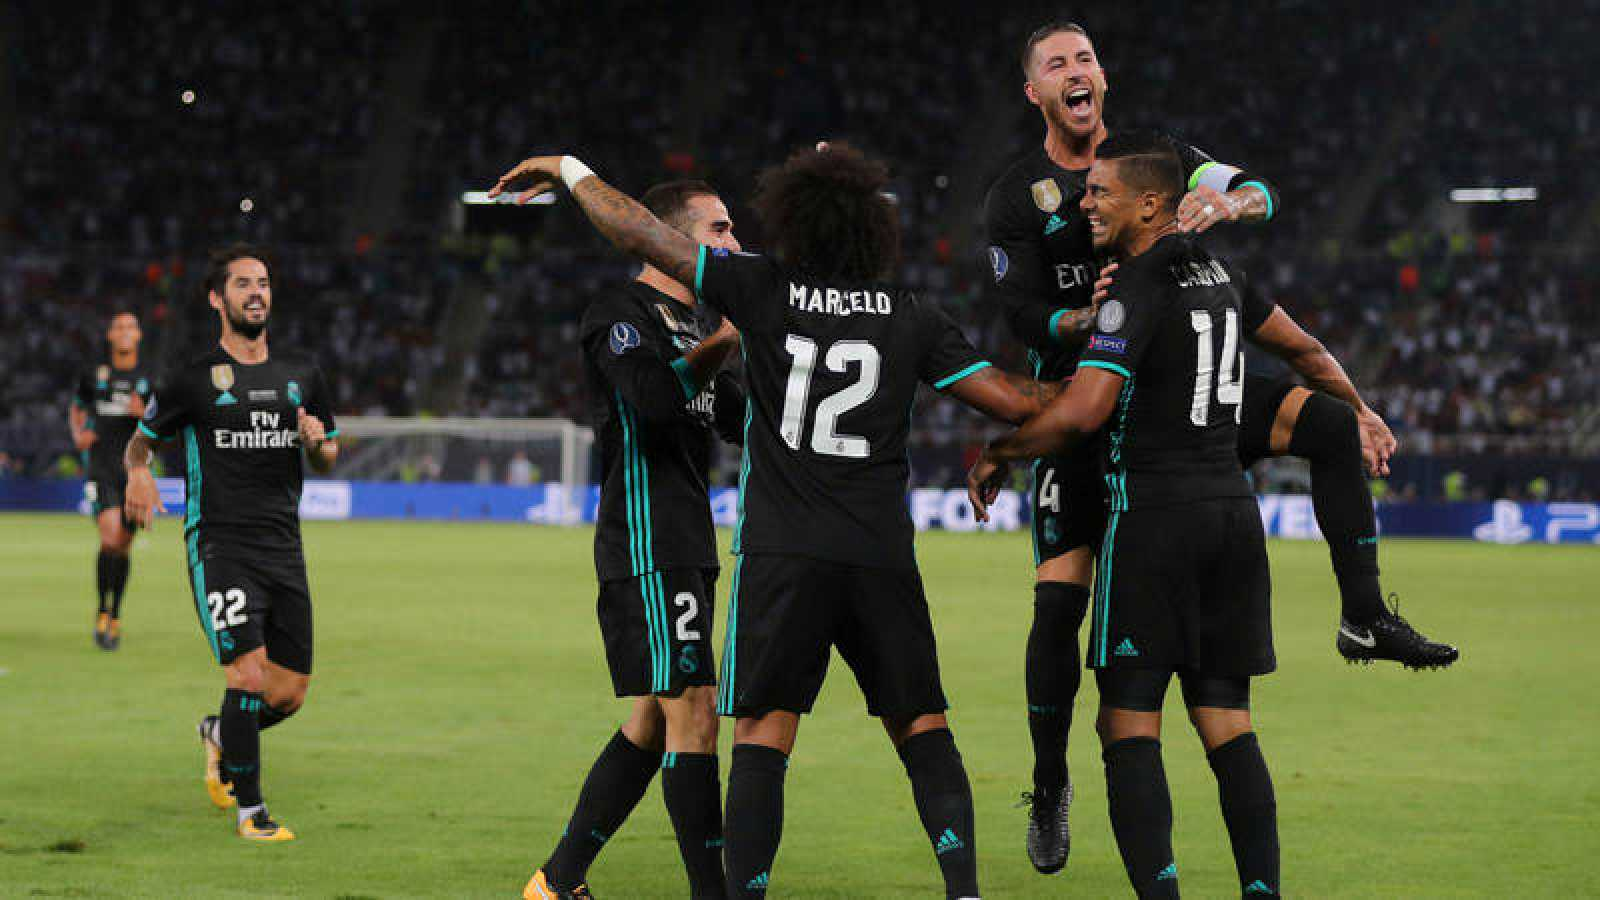 El Madrid gana la Supercopa de Europa